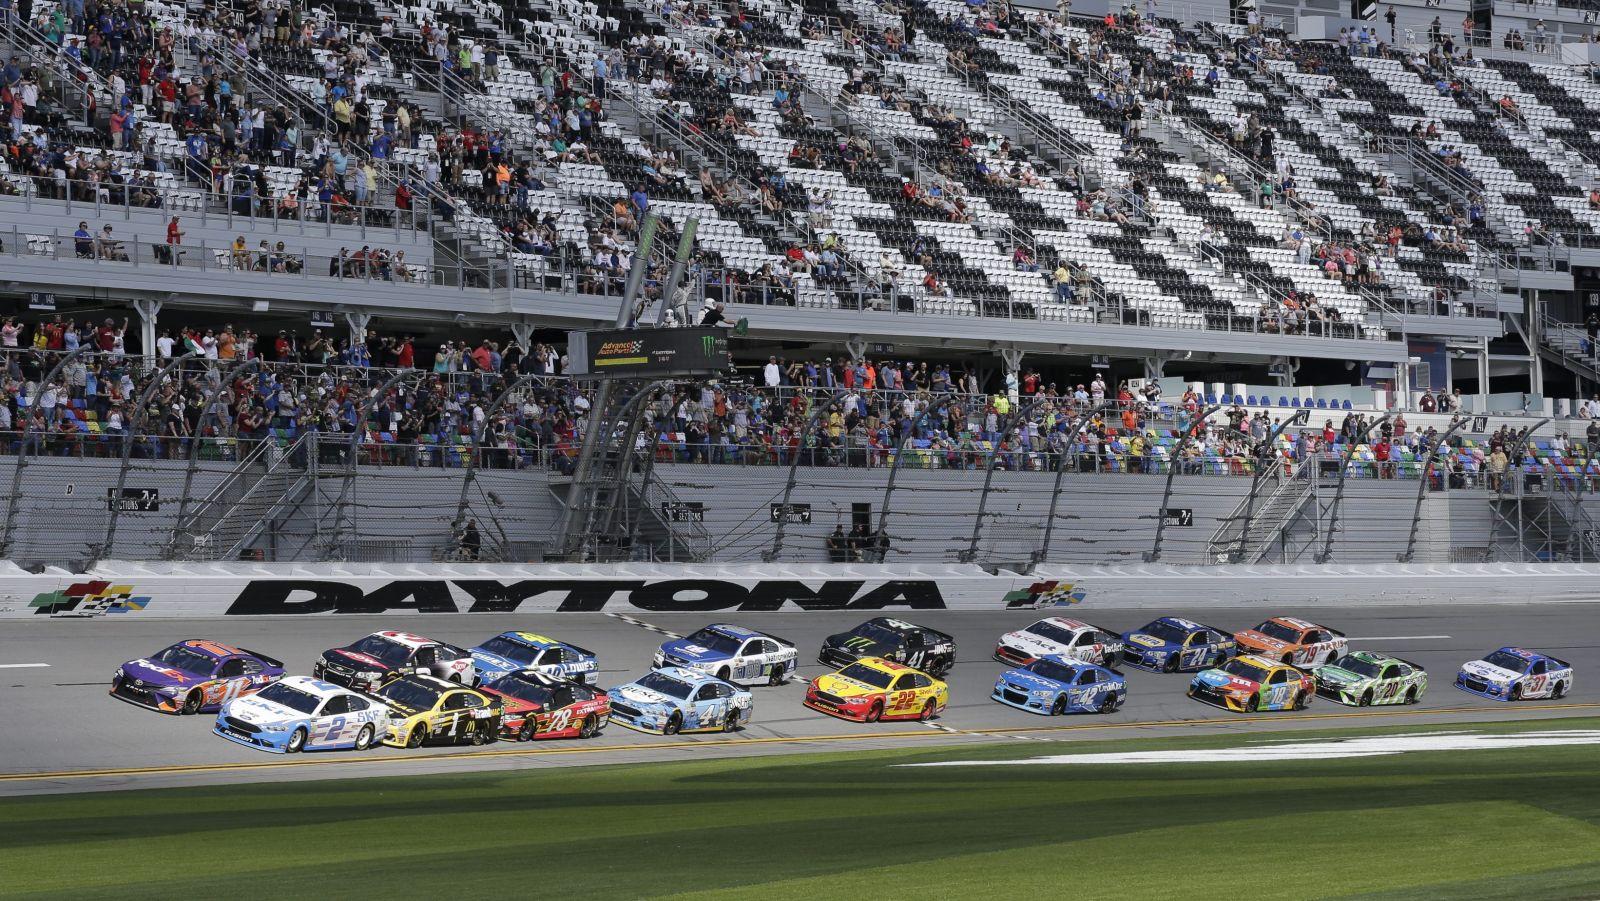 Brad Keselowski (2) and Denny Hamlin, front left, lead the field for the start of the NASCAR Clash auto race at Daytona International Speedway, Sunday, Feb. 19, 2017, in Daytona Beach, Fla. (AP Photo/Terry Renna)